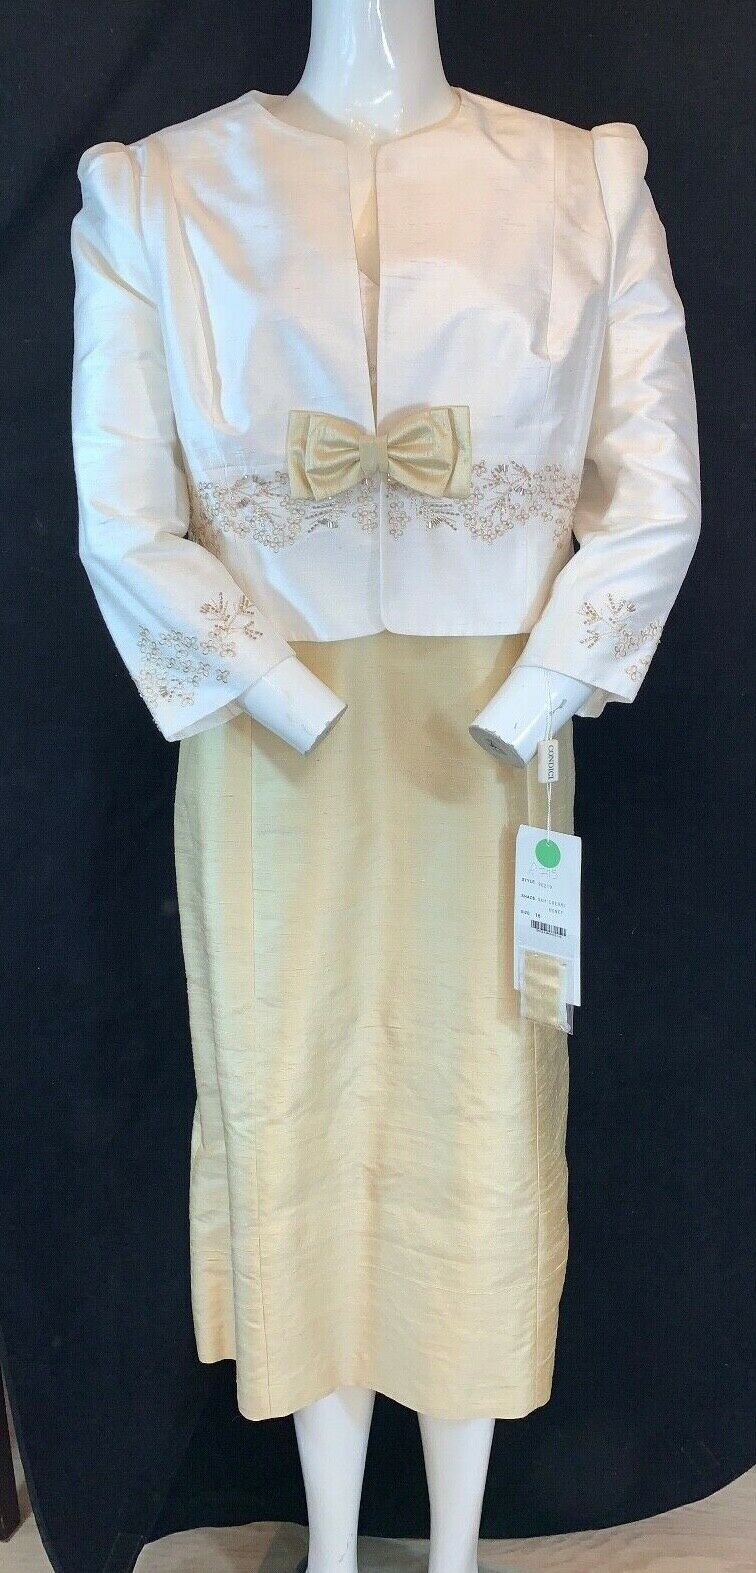 BNWT CONDICI 90219 Cream/Honey Shift Dress & Jacket.100% Silk. Mother Bride UK16